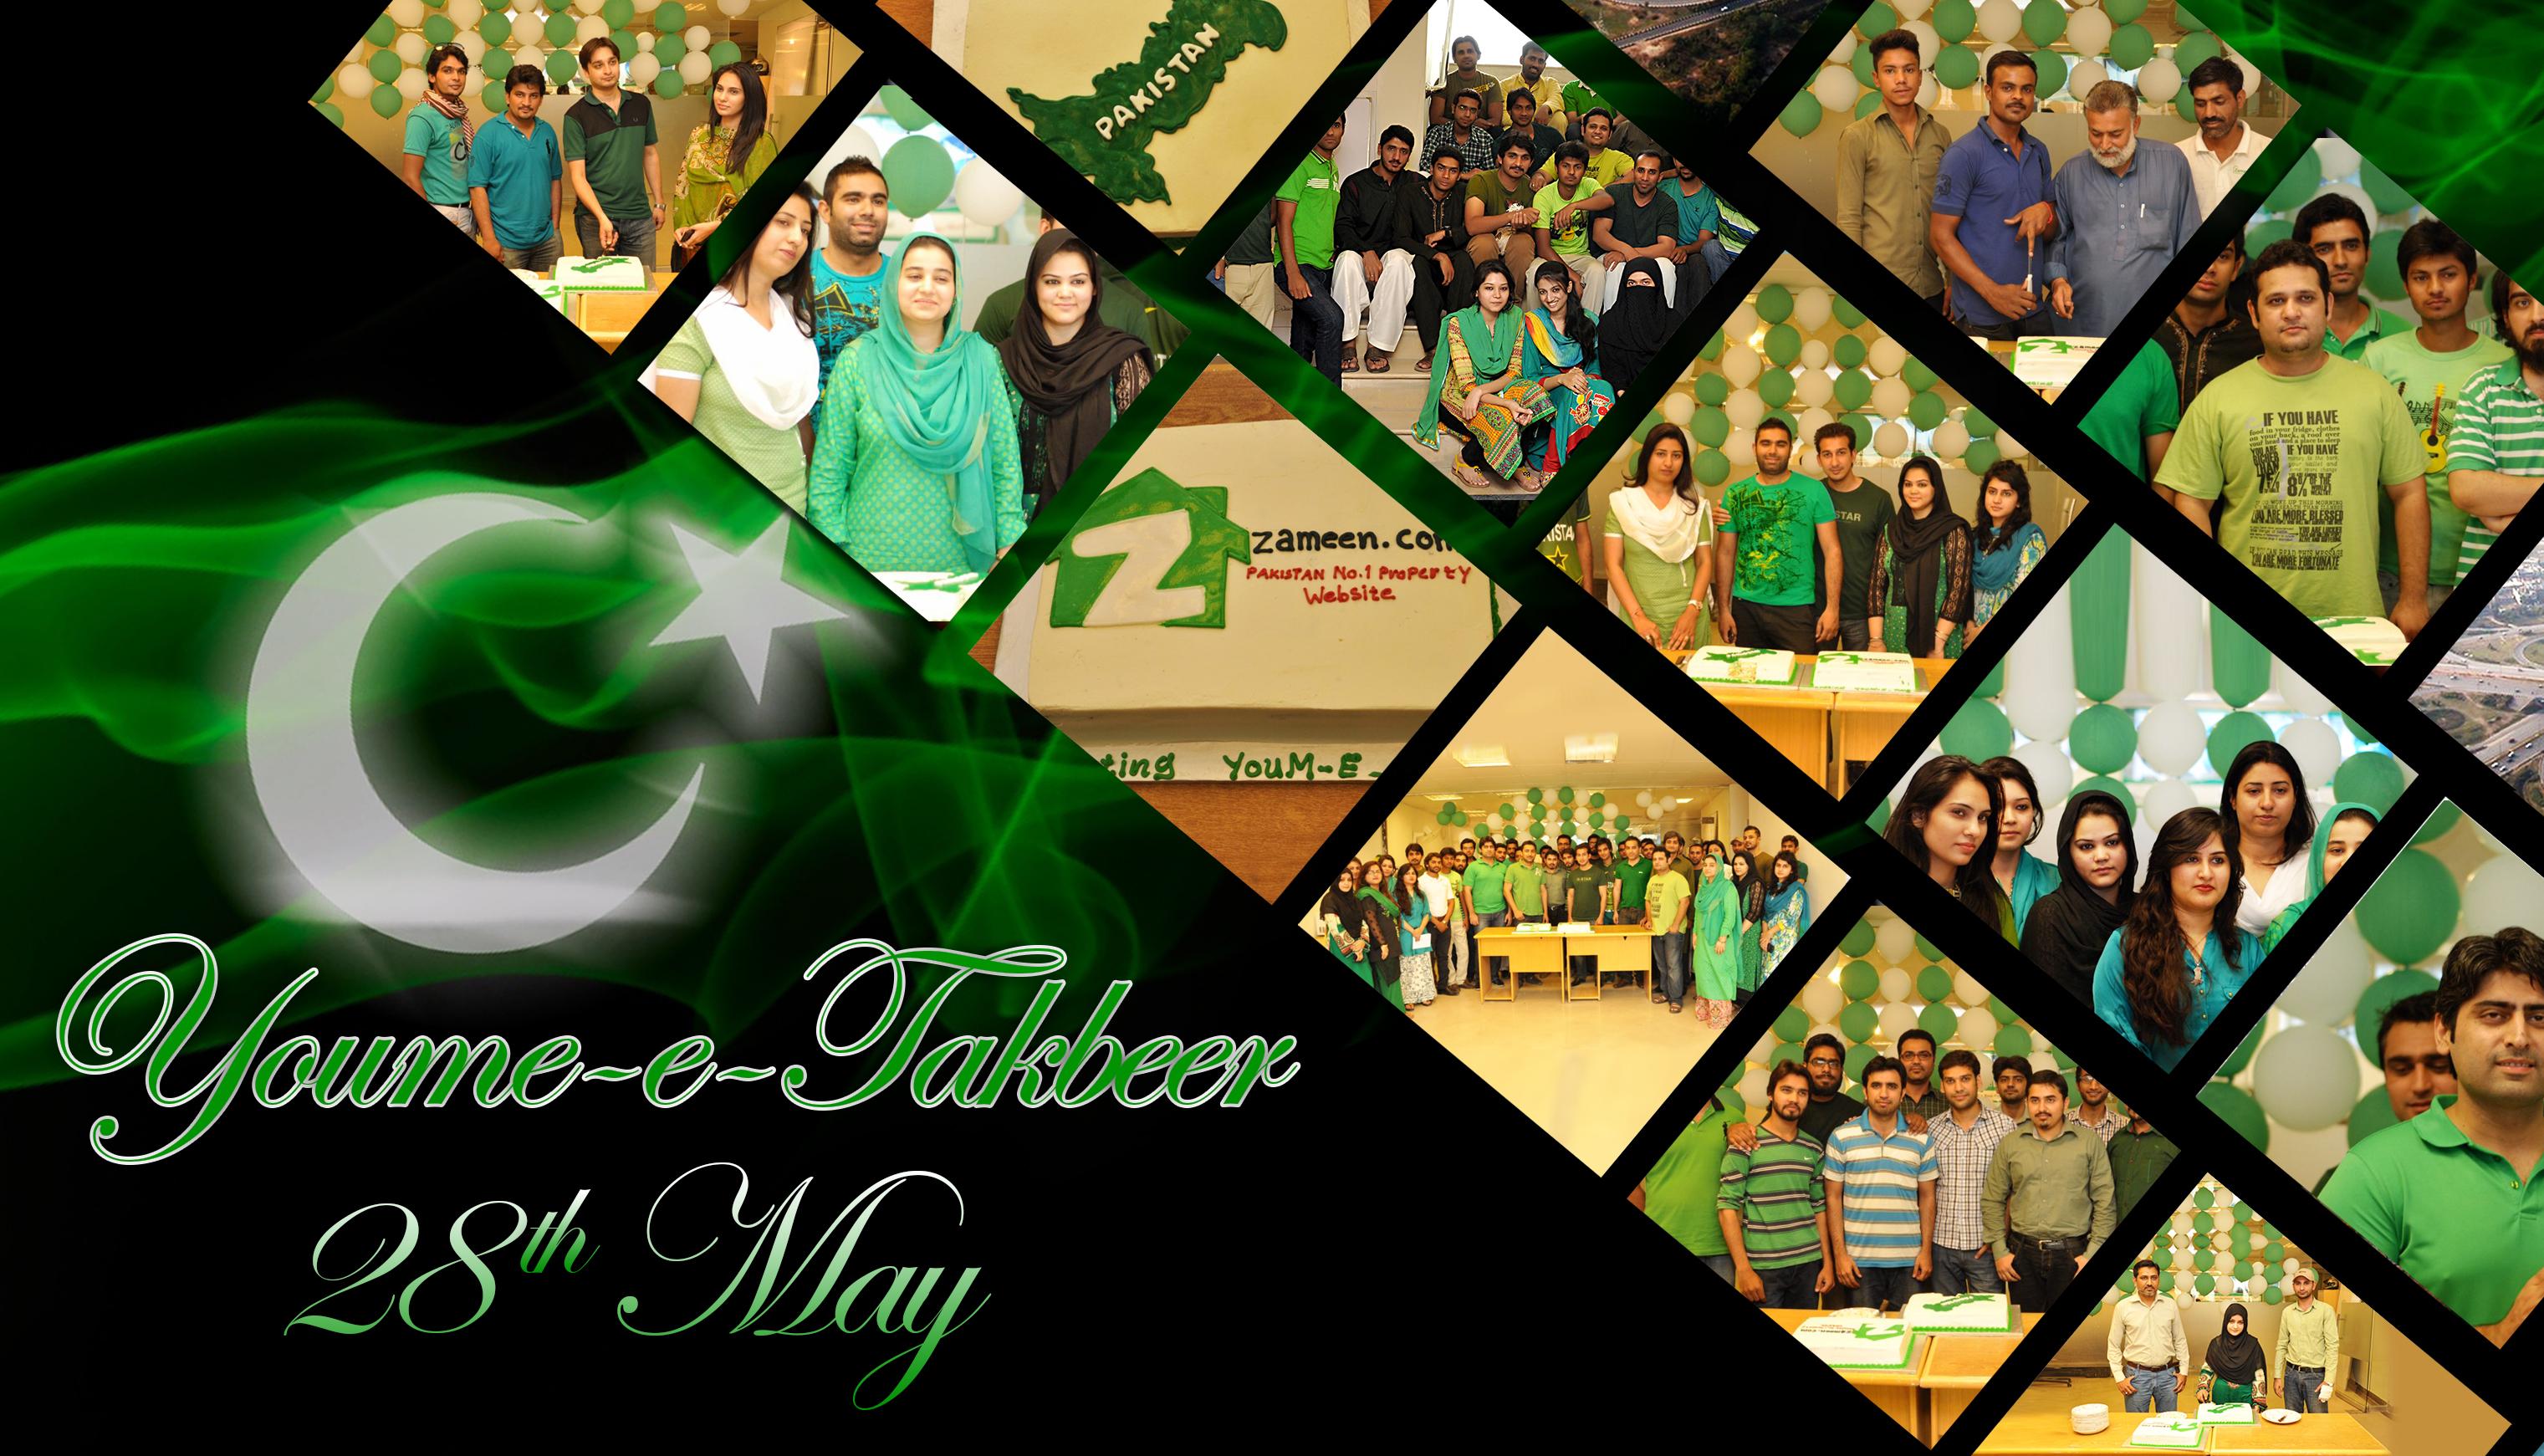 Zameen.com celebrates youm-e-Takbeer